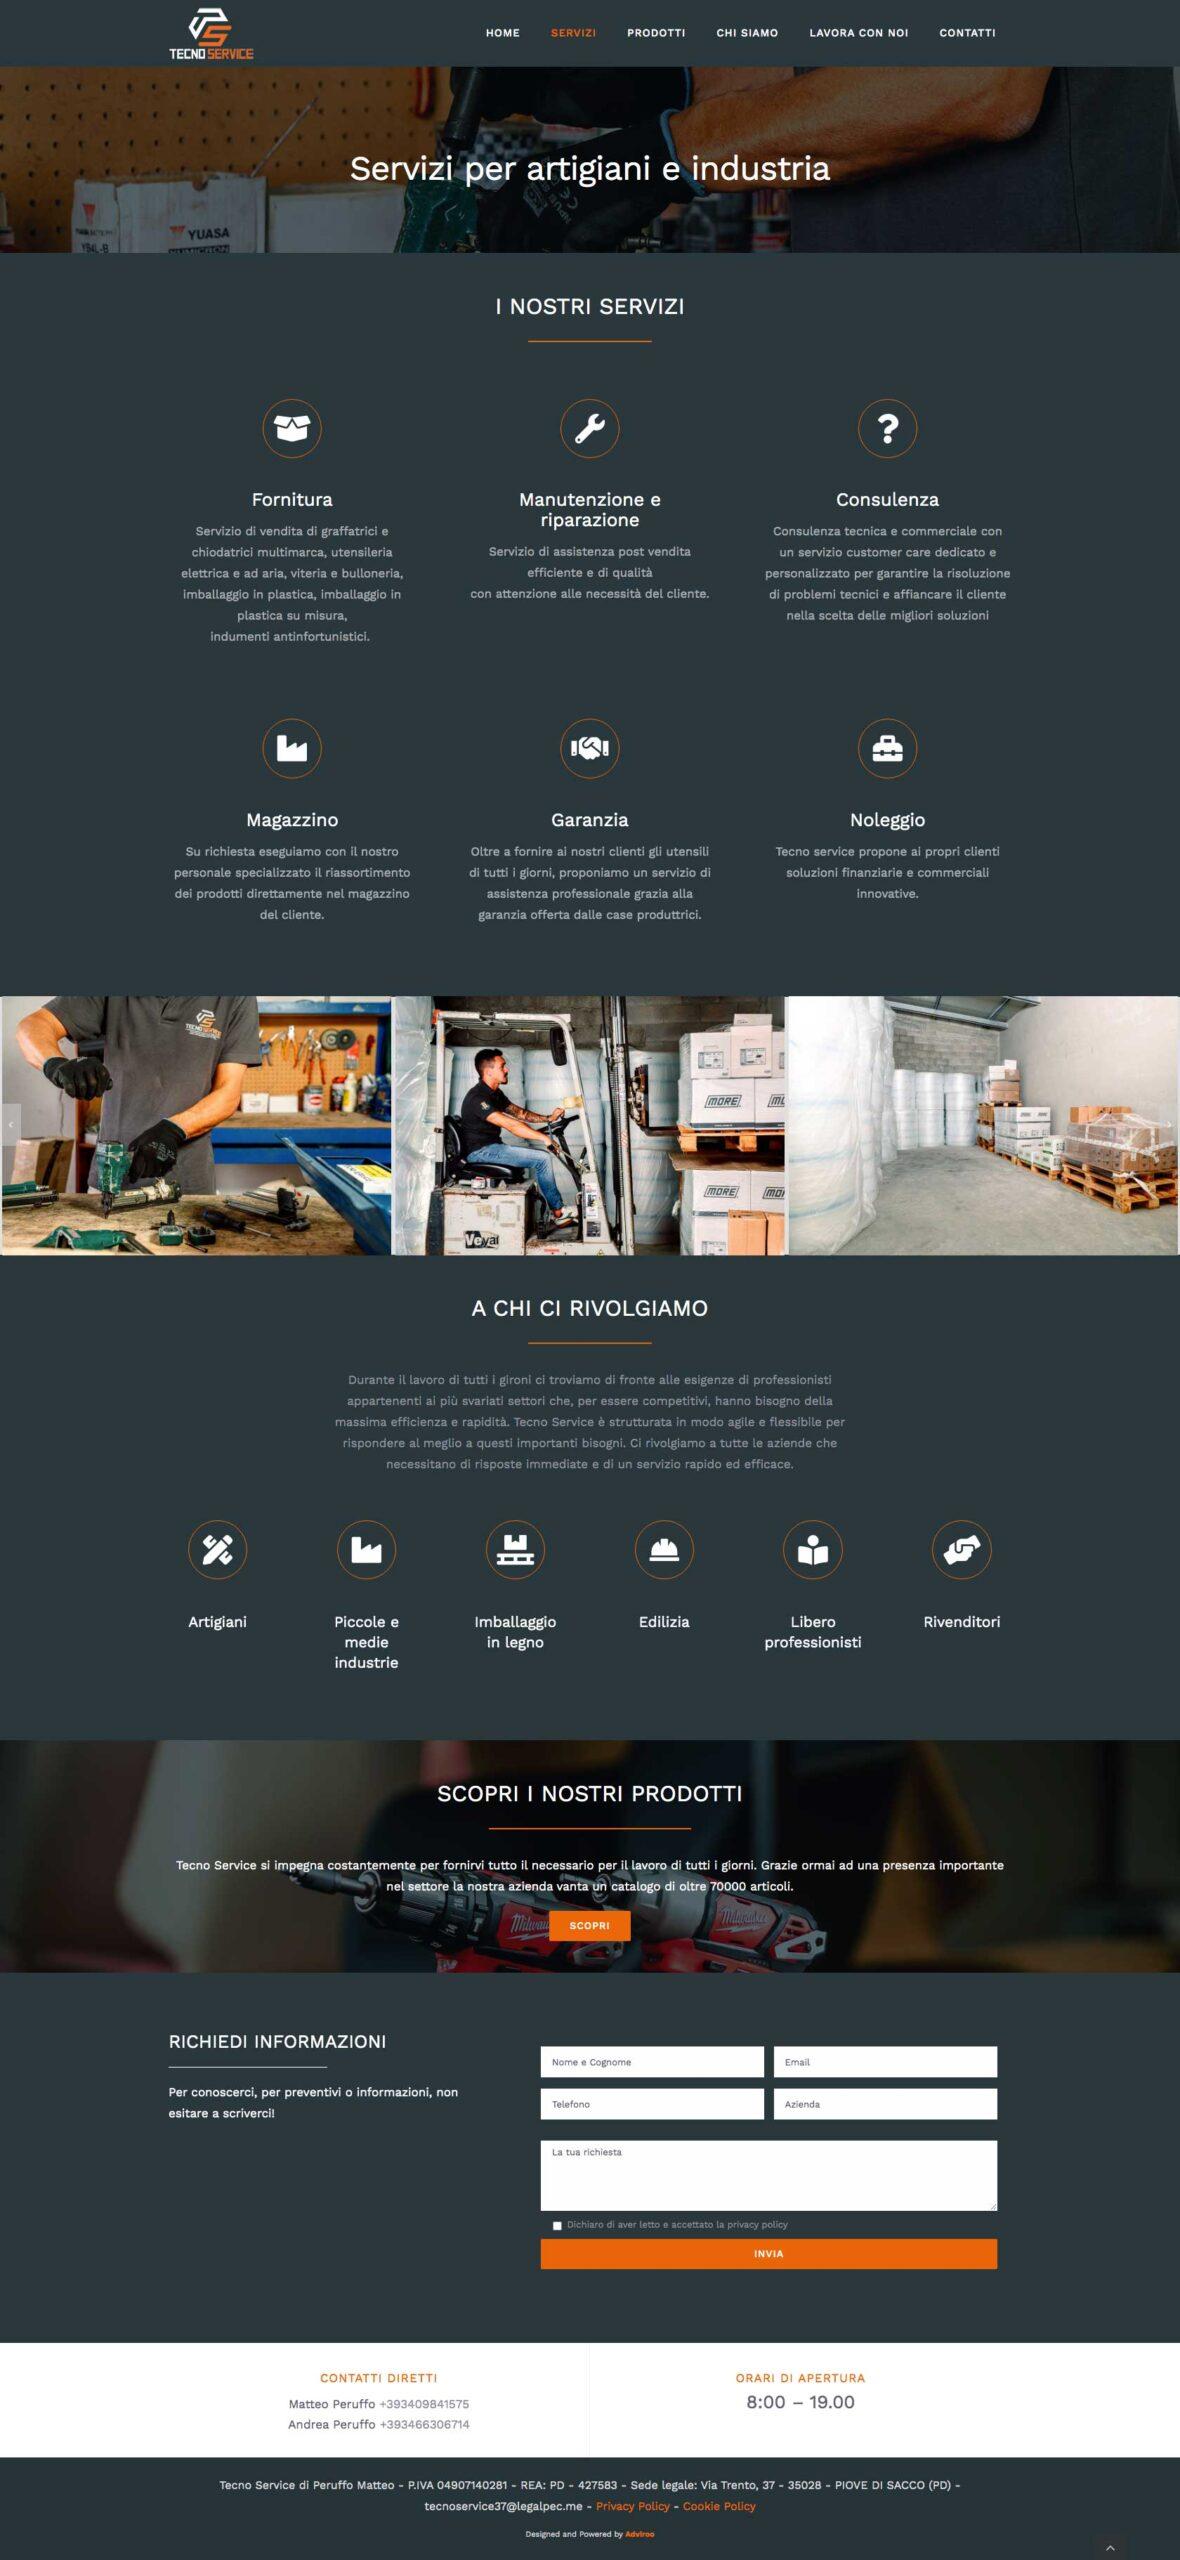 Servizi - Website Tecno Service - web design by Adviroo